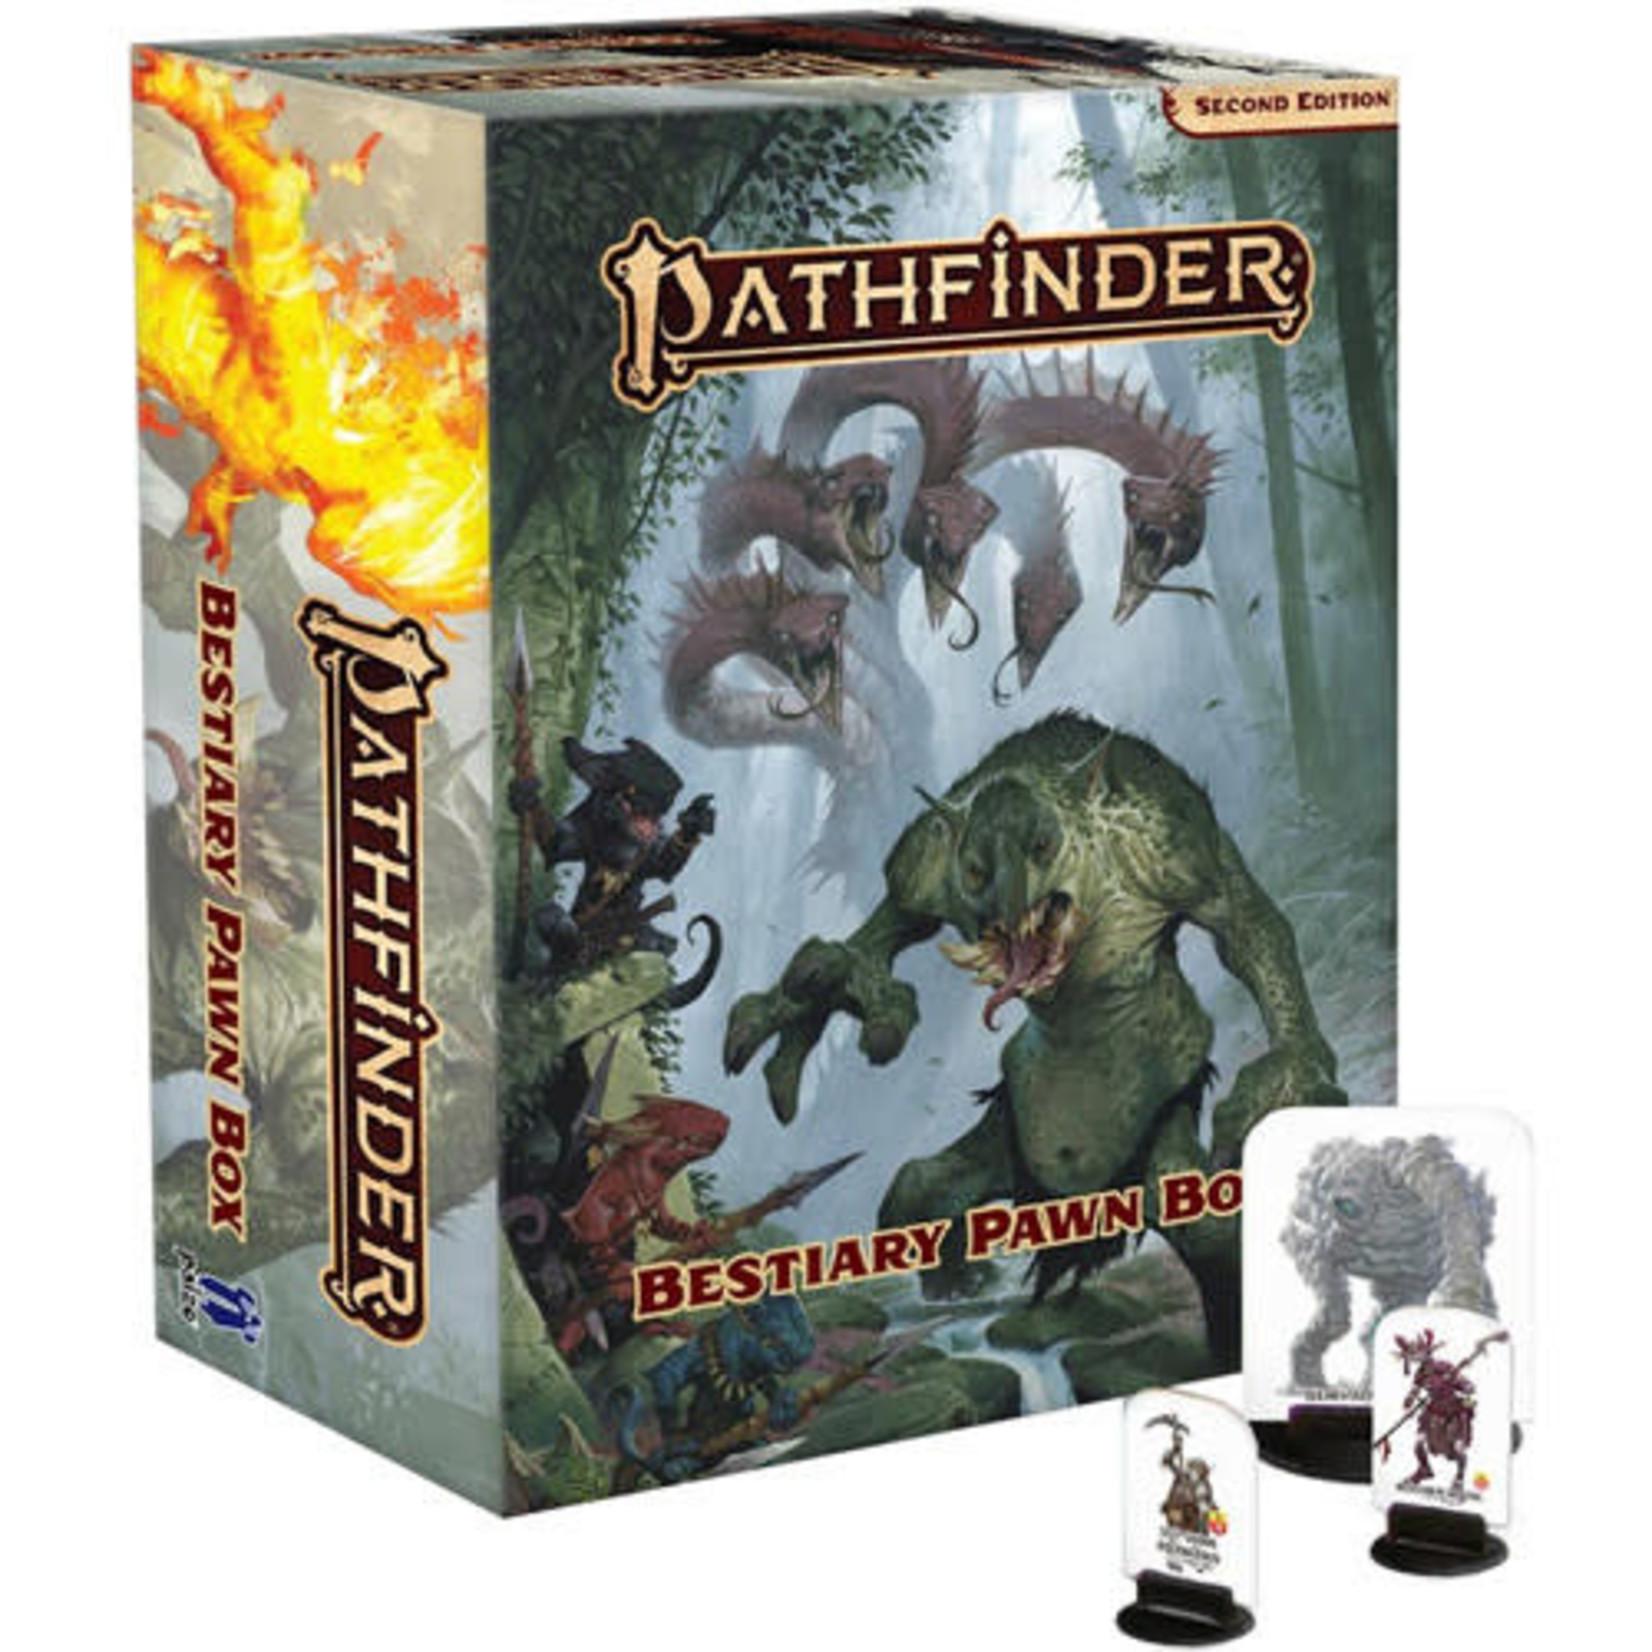 Paizo Pathfinder Roleplaying Game Second Edition: Pawns - Bestiary Box